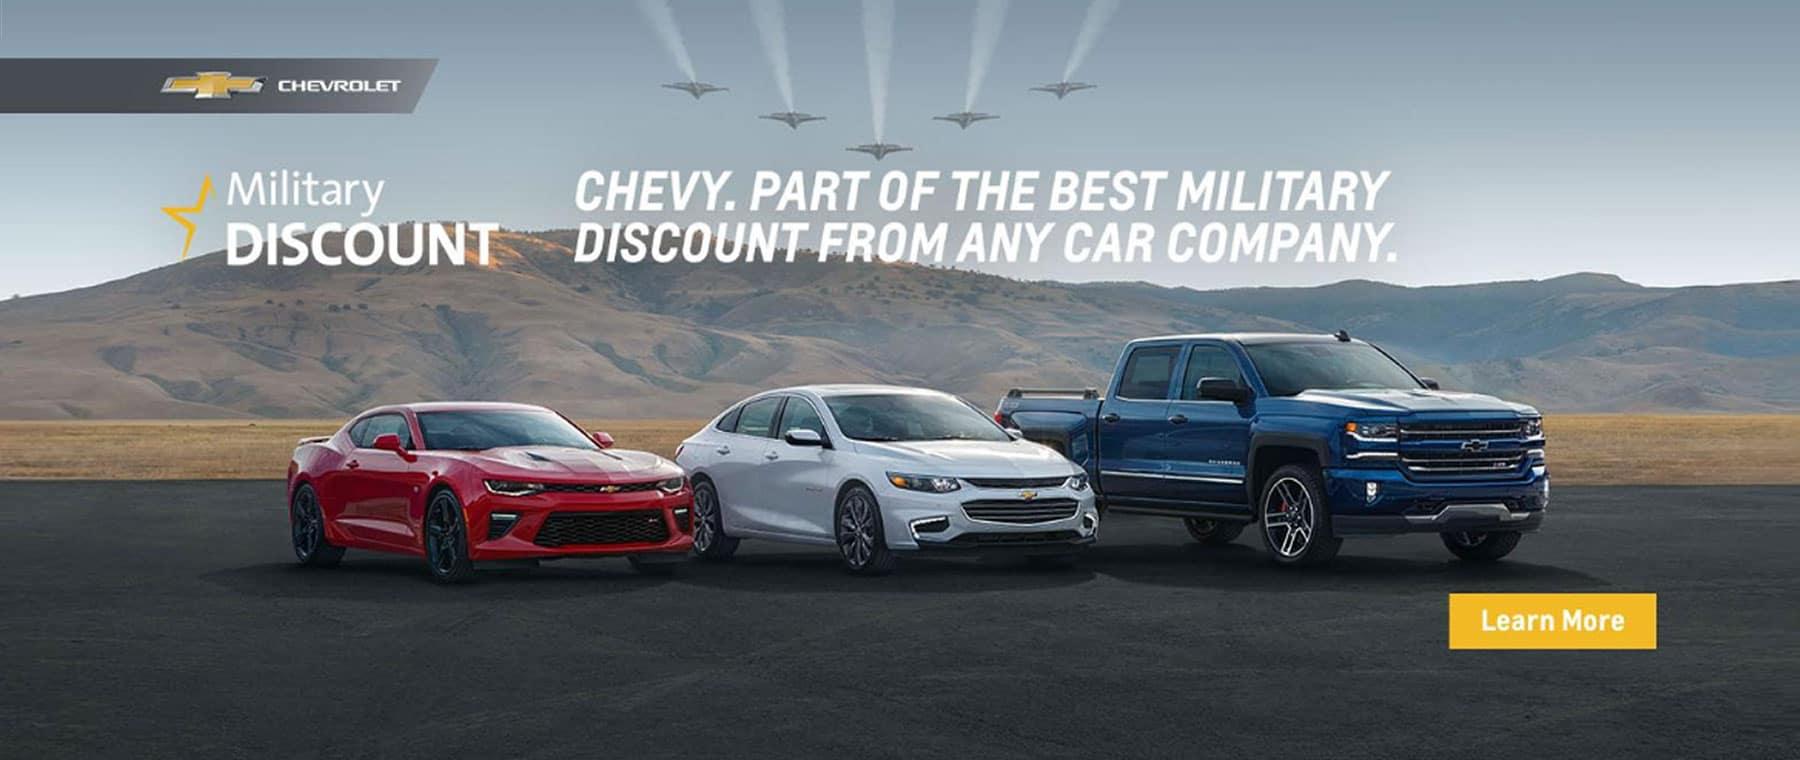 Sandy Sansing Chevrolet Pensacola FL Military Discount